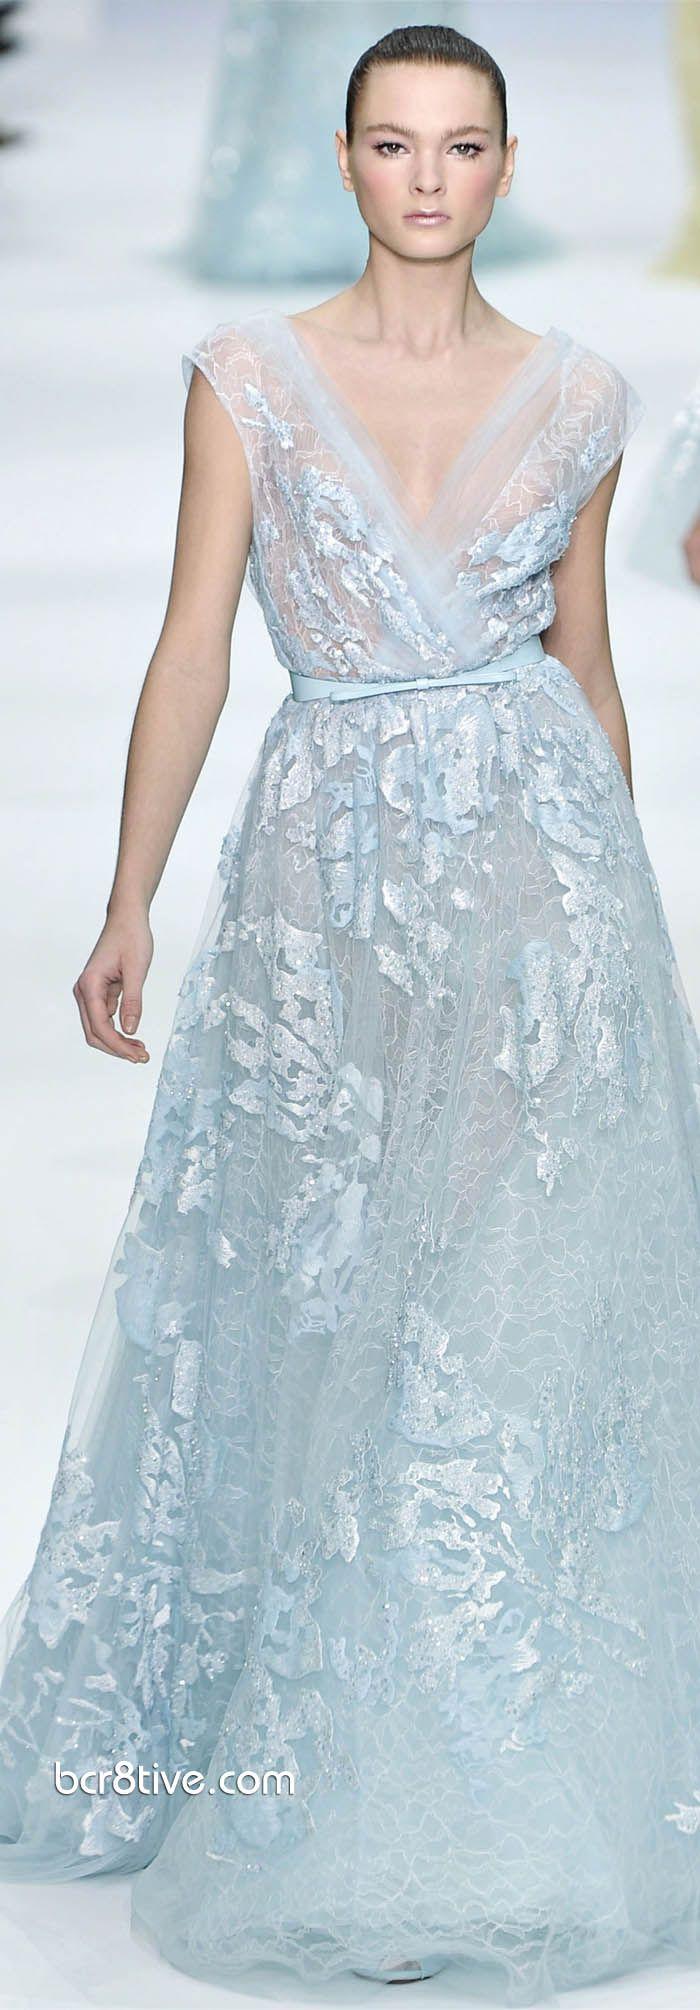 Elie saab spring summer haute couture haute couture